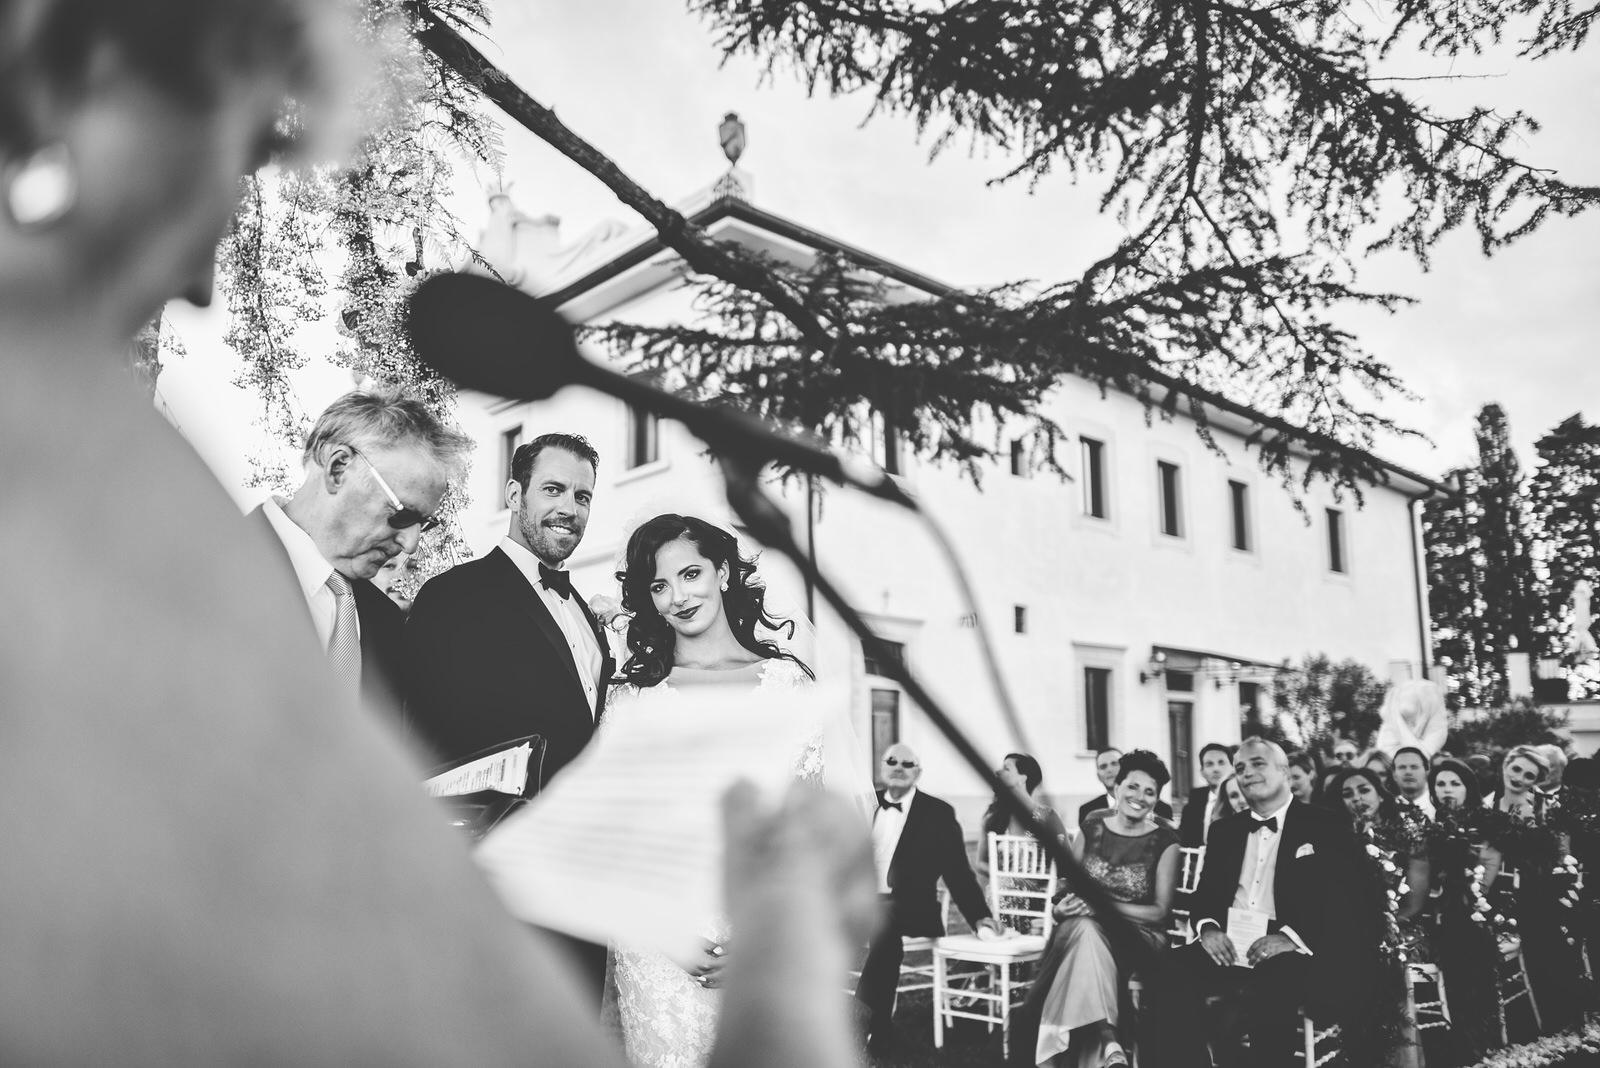 wedding photographer in italy-venice-tuscany-florence-amalfi coast-como lake-villa del balbianello-siena-amalfi-ravello-belmond-villa cimbrone32